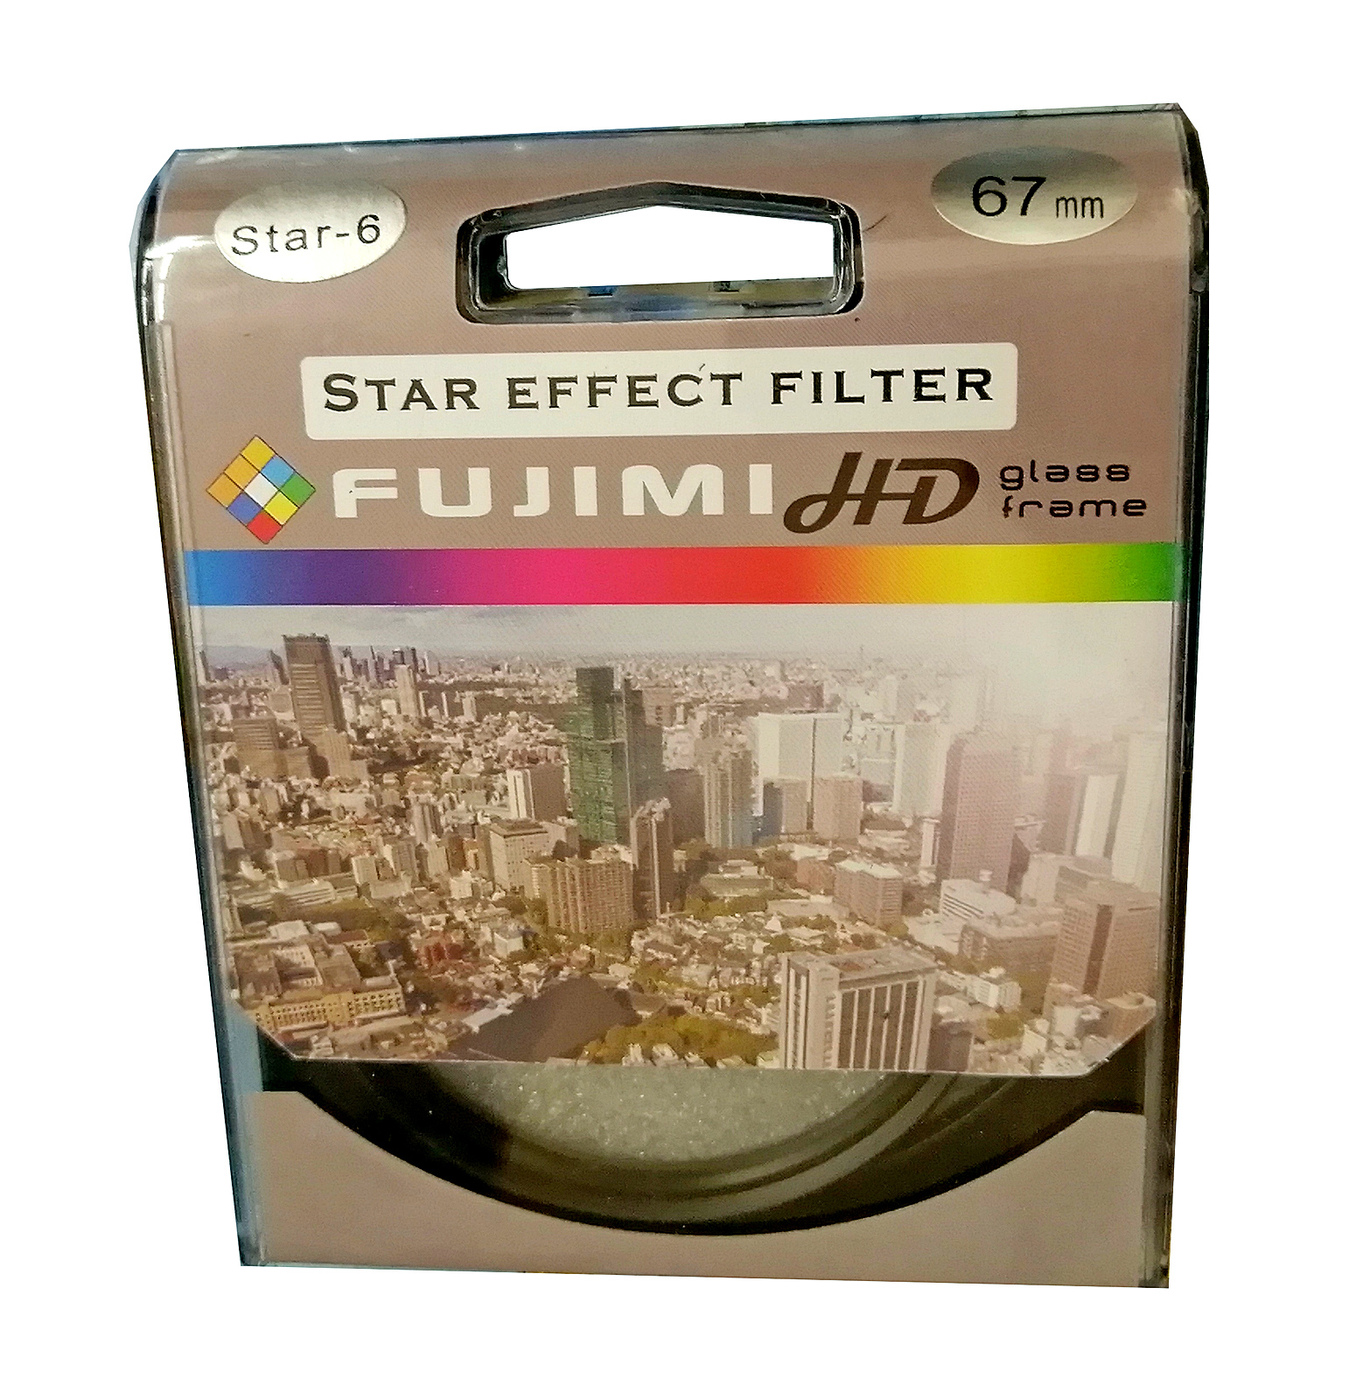 Светофильтр Fujimi Star-6 EFFECT dHD 67мм